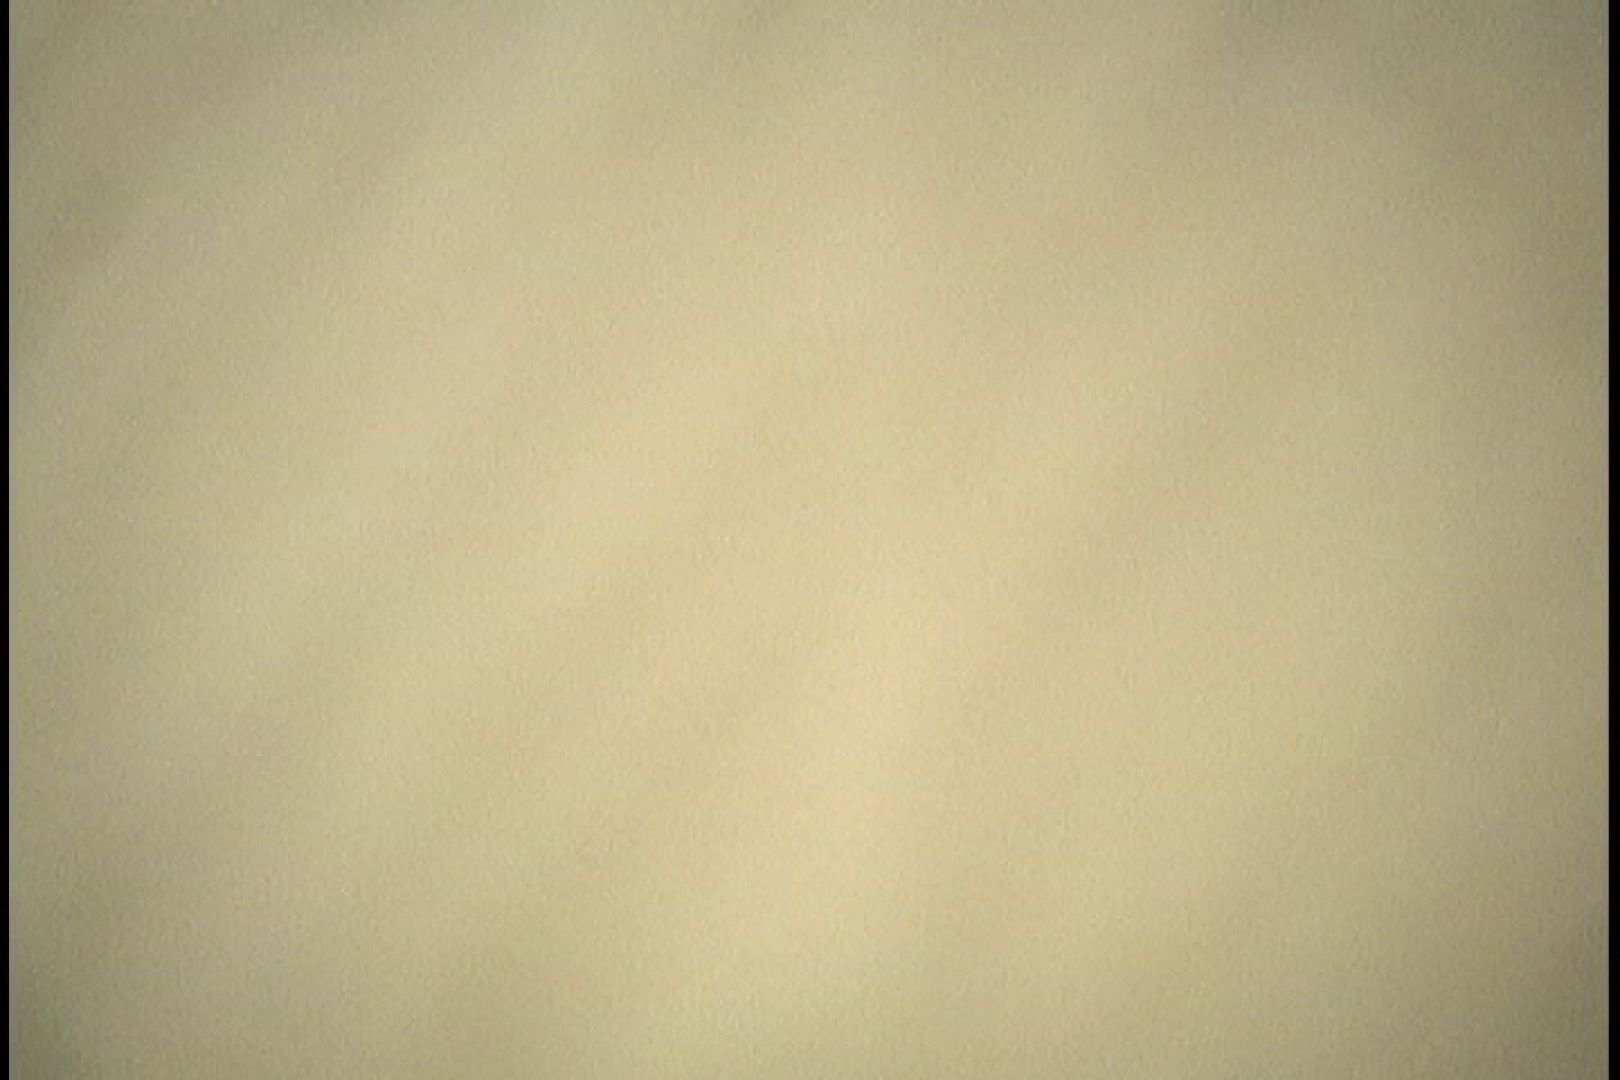 No.97 そびえ立つ陰毛 シャワー室 ぱこり動画紹介 33画像 33